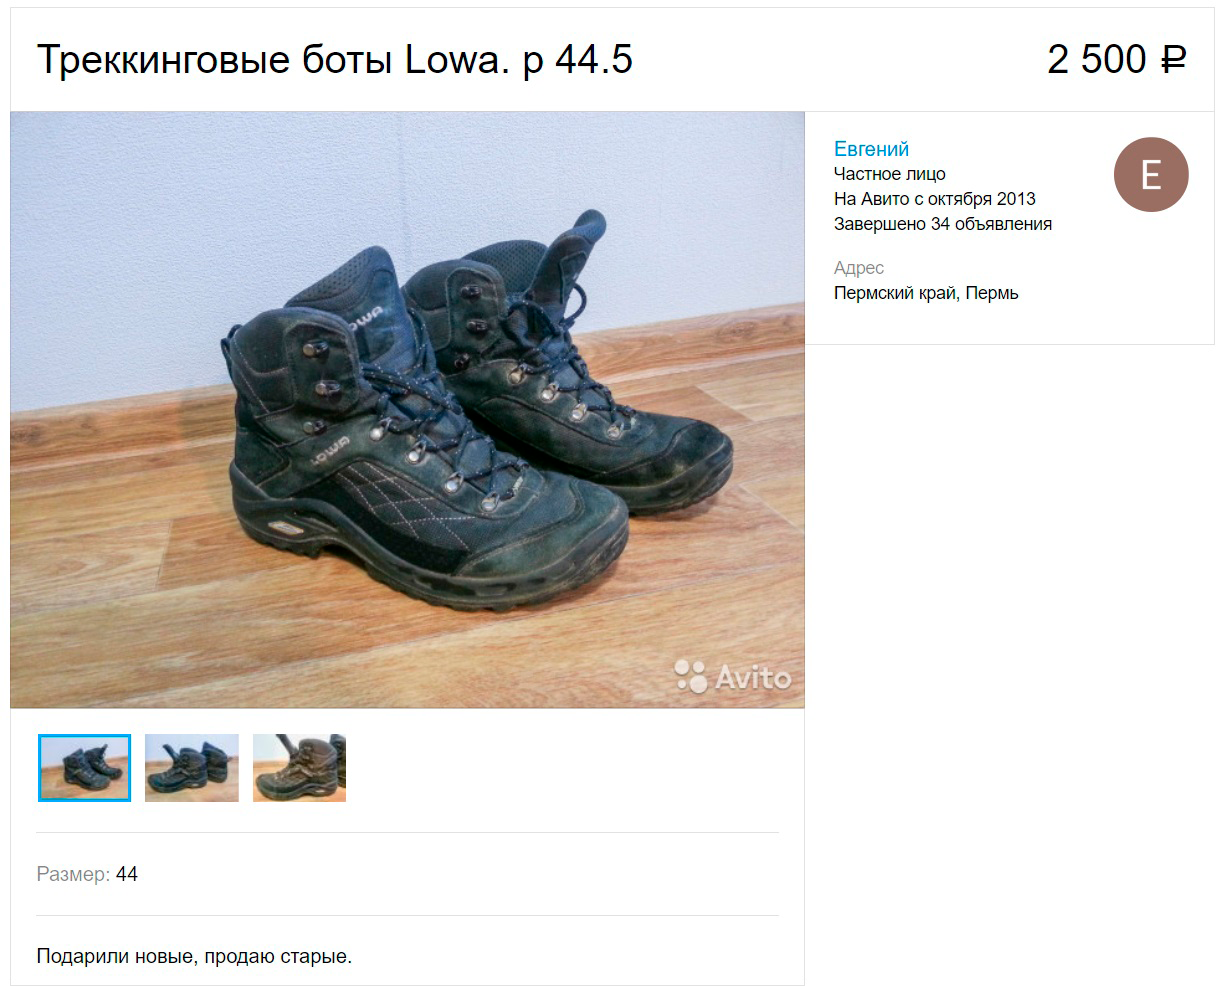 Объявление о продаже ботинок на «Авито»